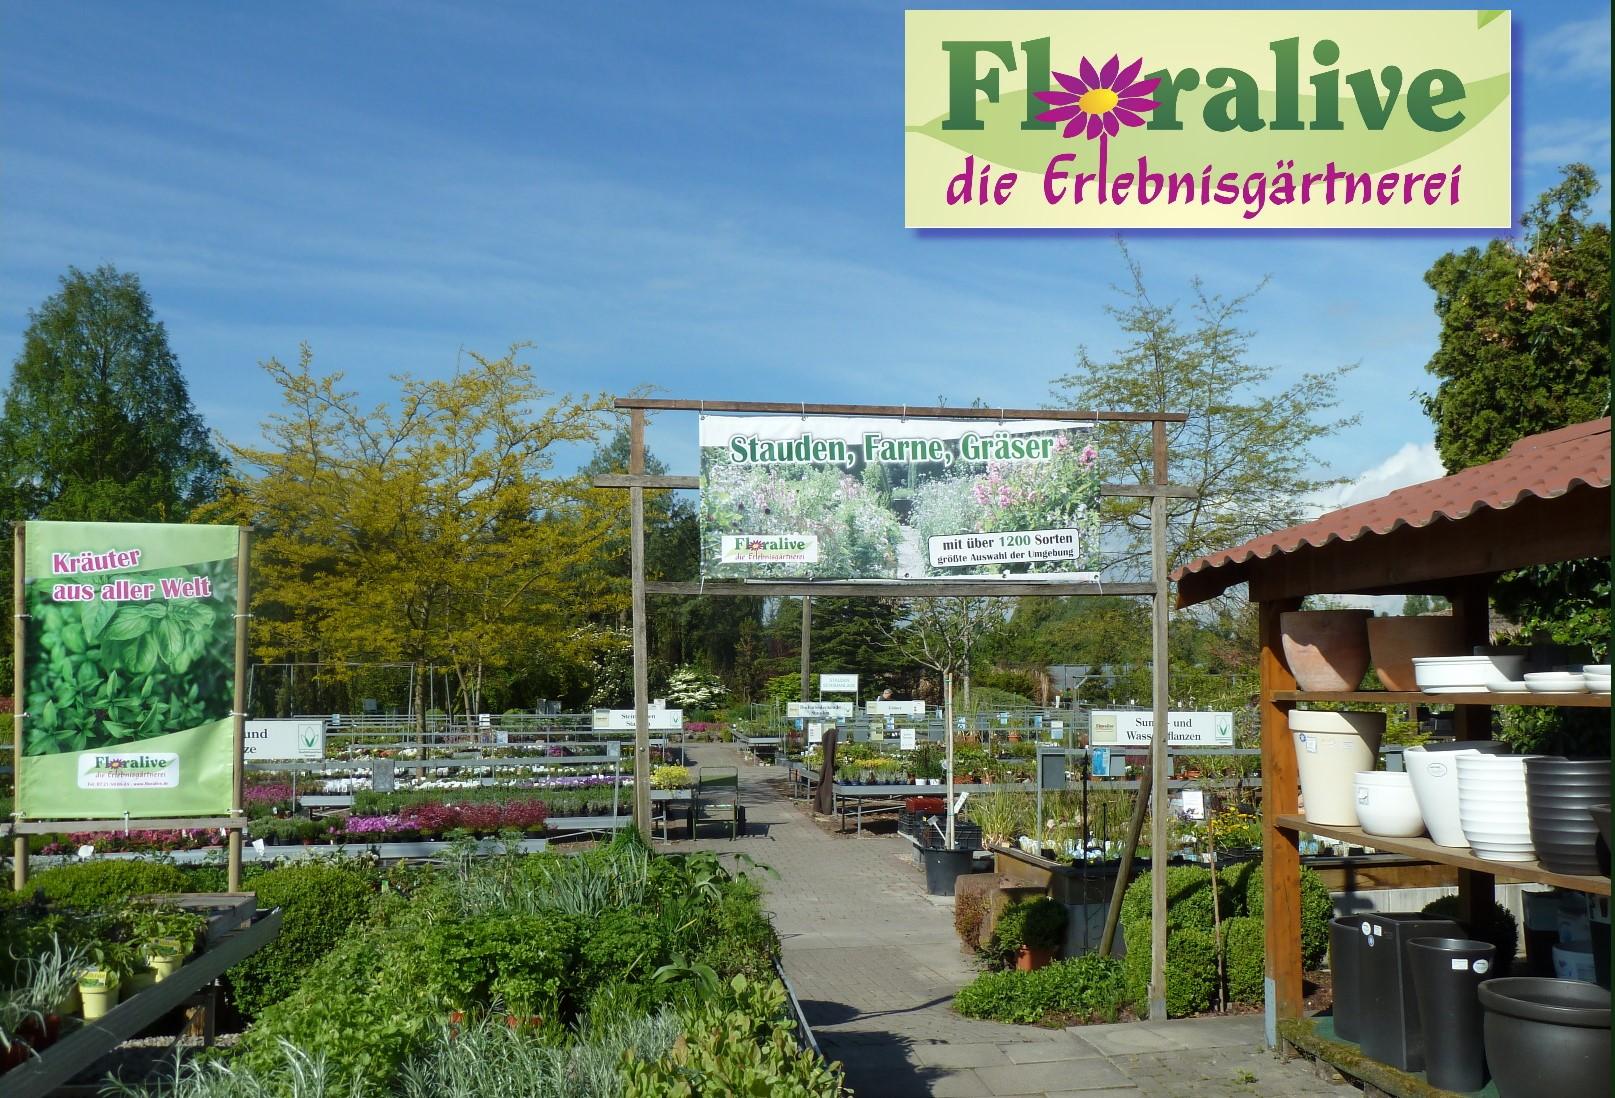 FLORALIVE Gärtnerei